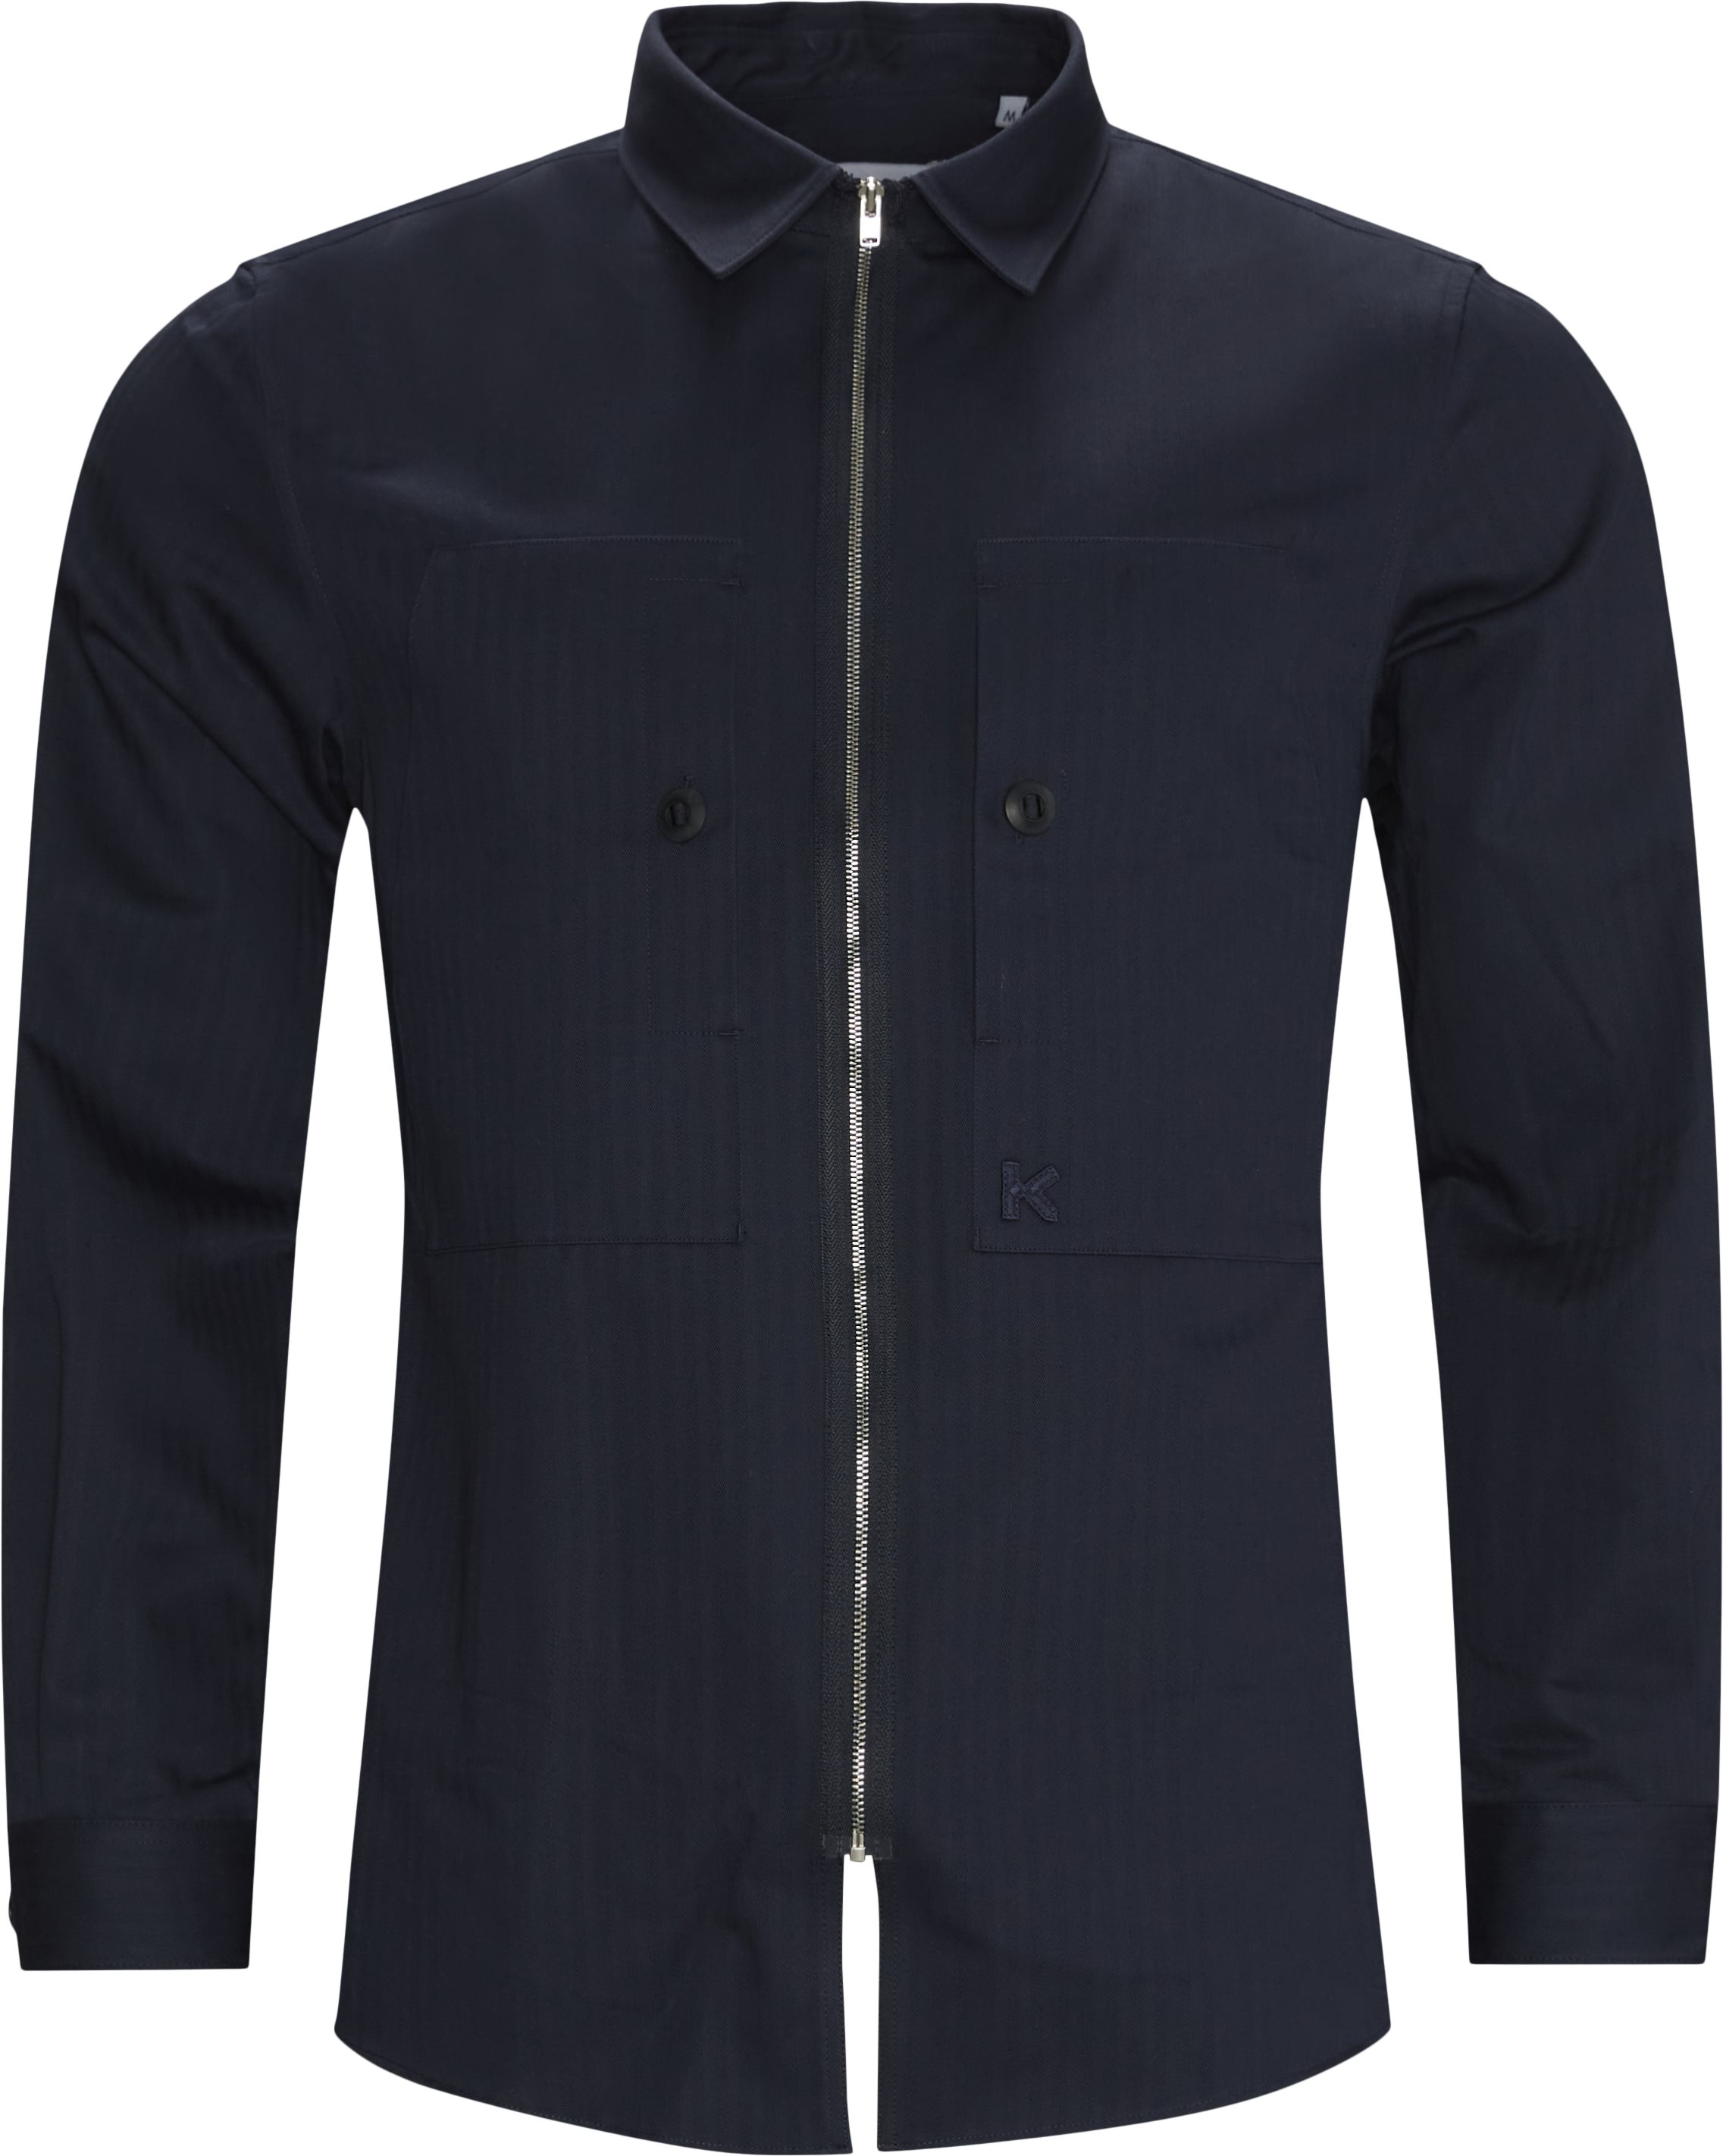 Zip Shirt - Skjorter - Regular fit - Blå